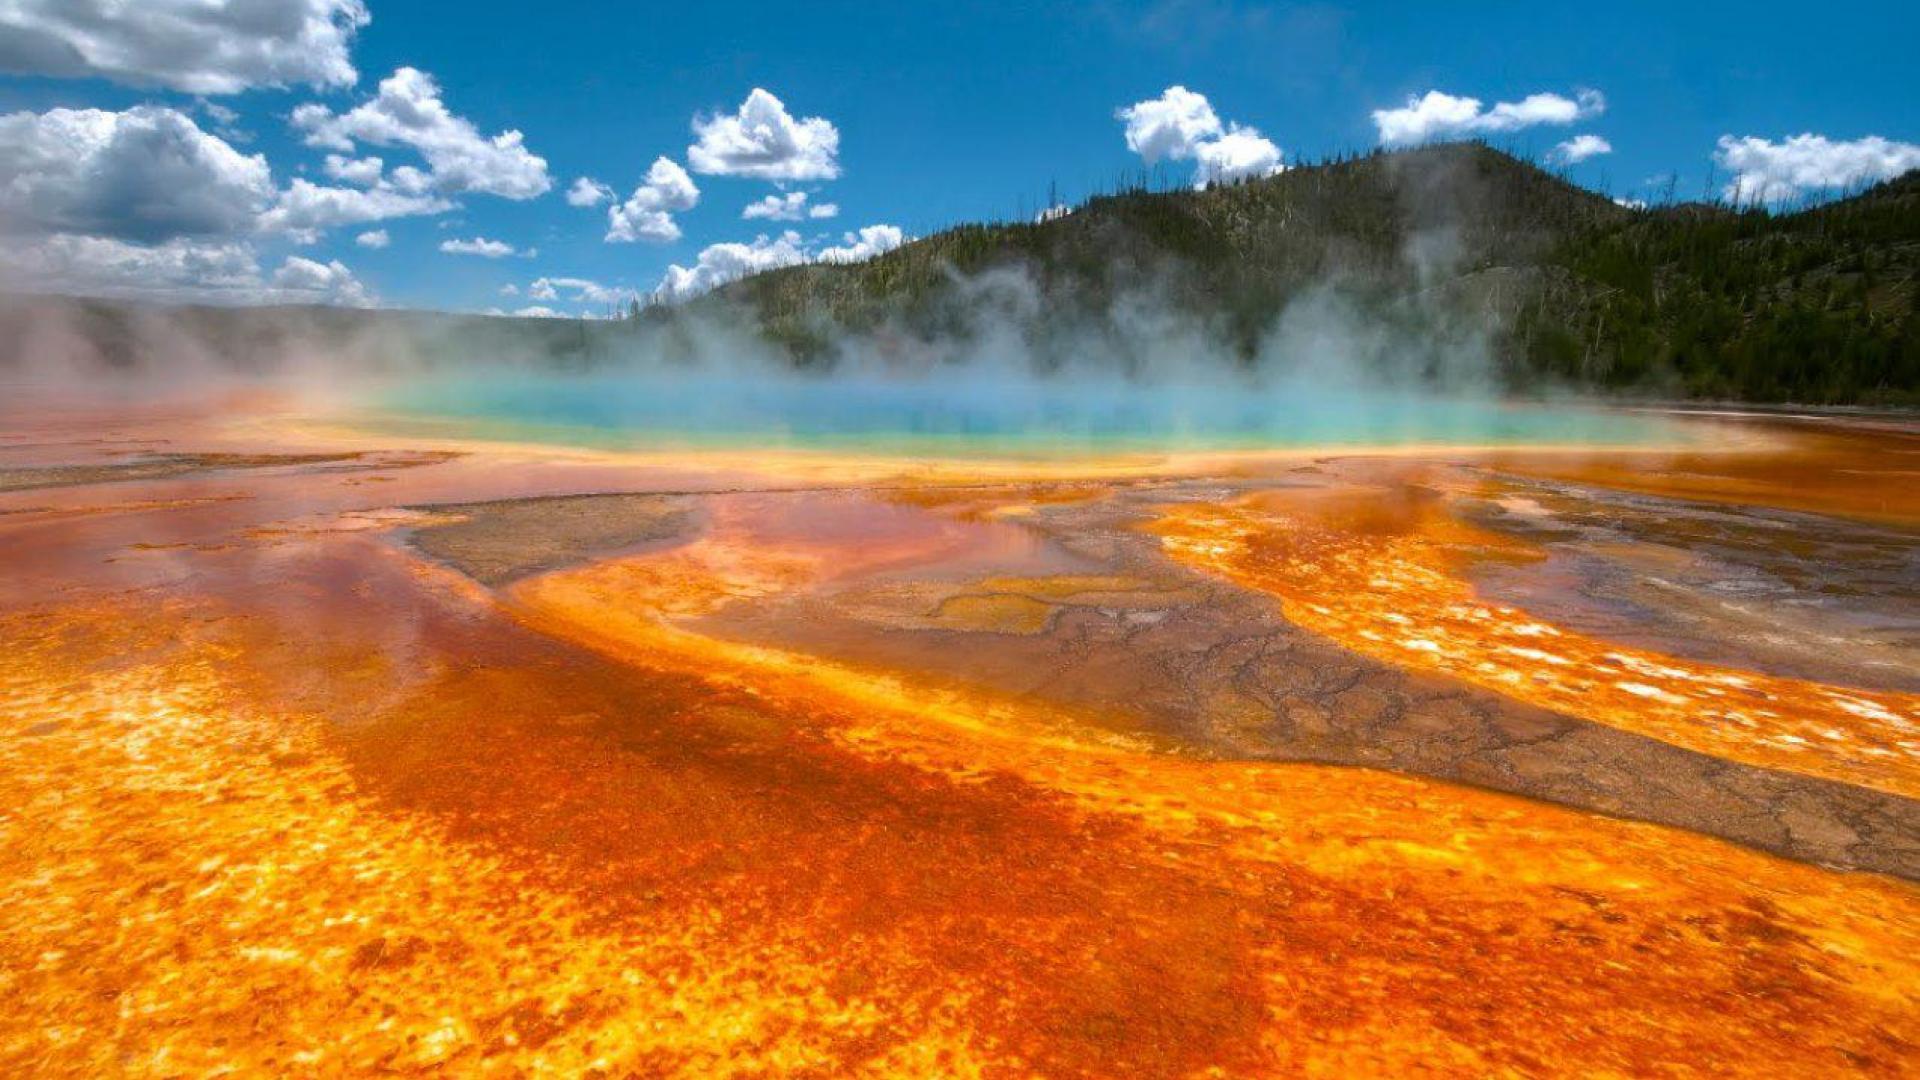 Yellowstone national park HQ WALLPAPER   162112 1920x1080